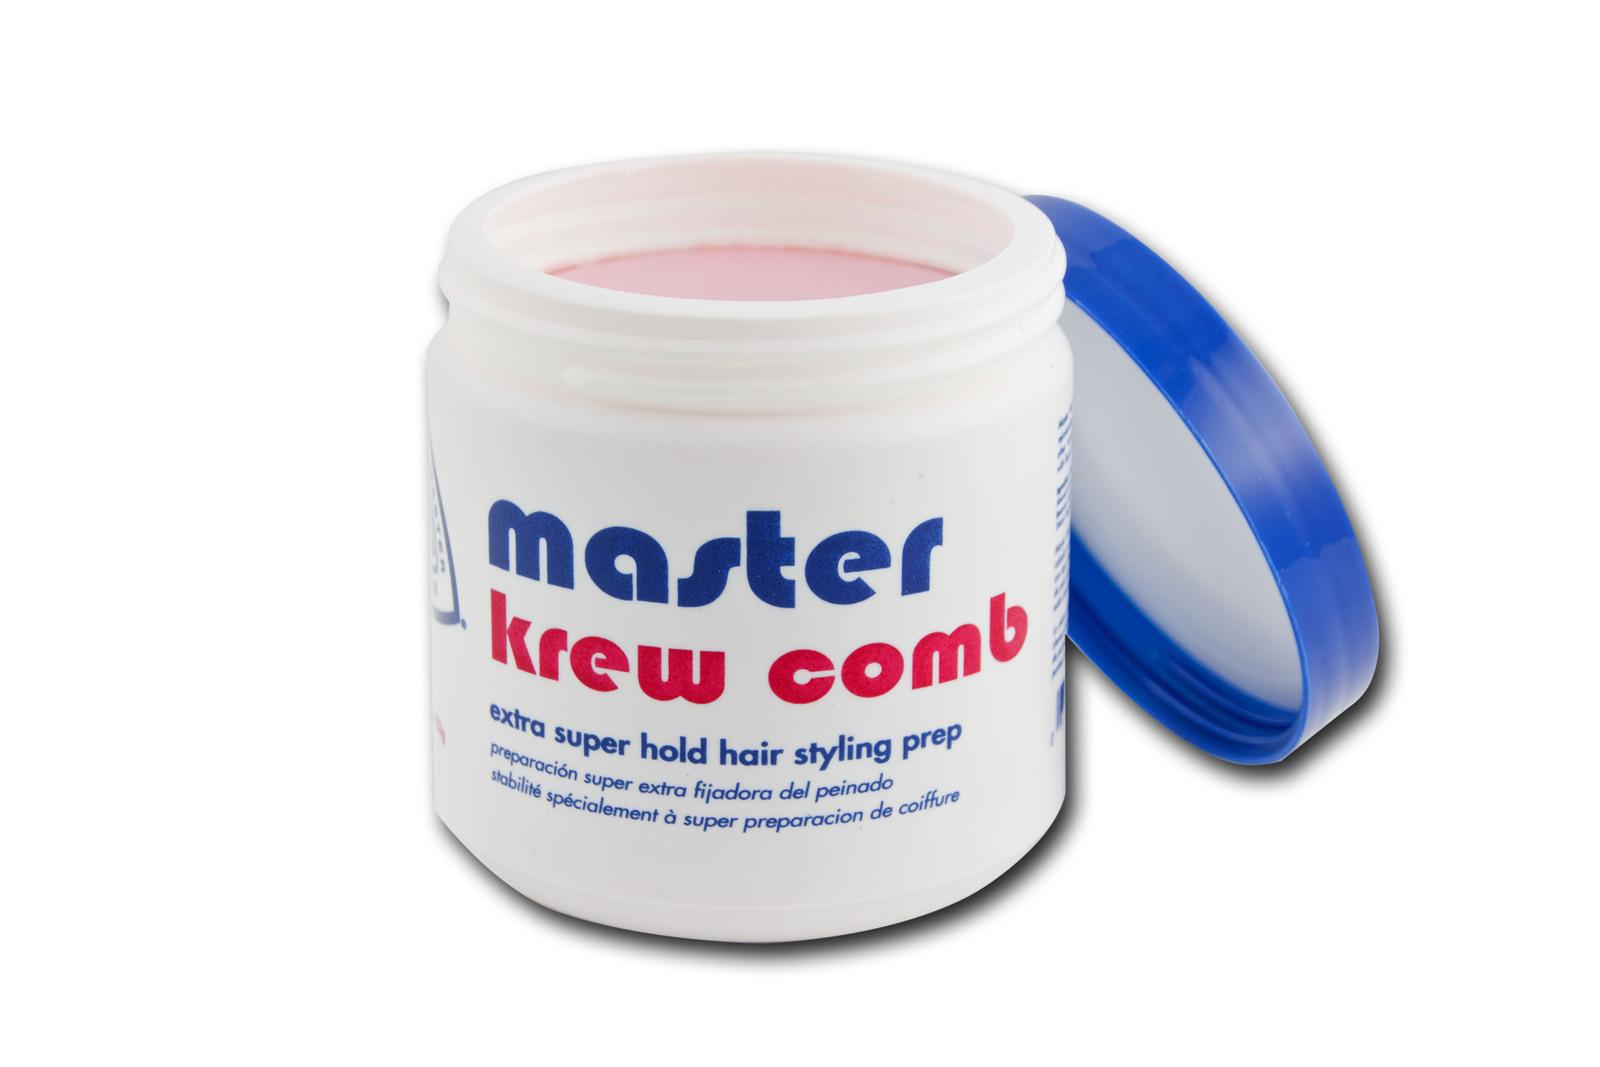 Master krew comb